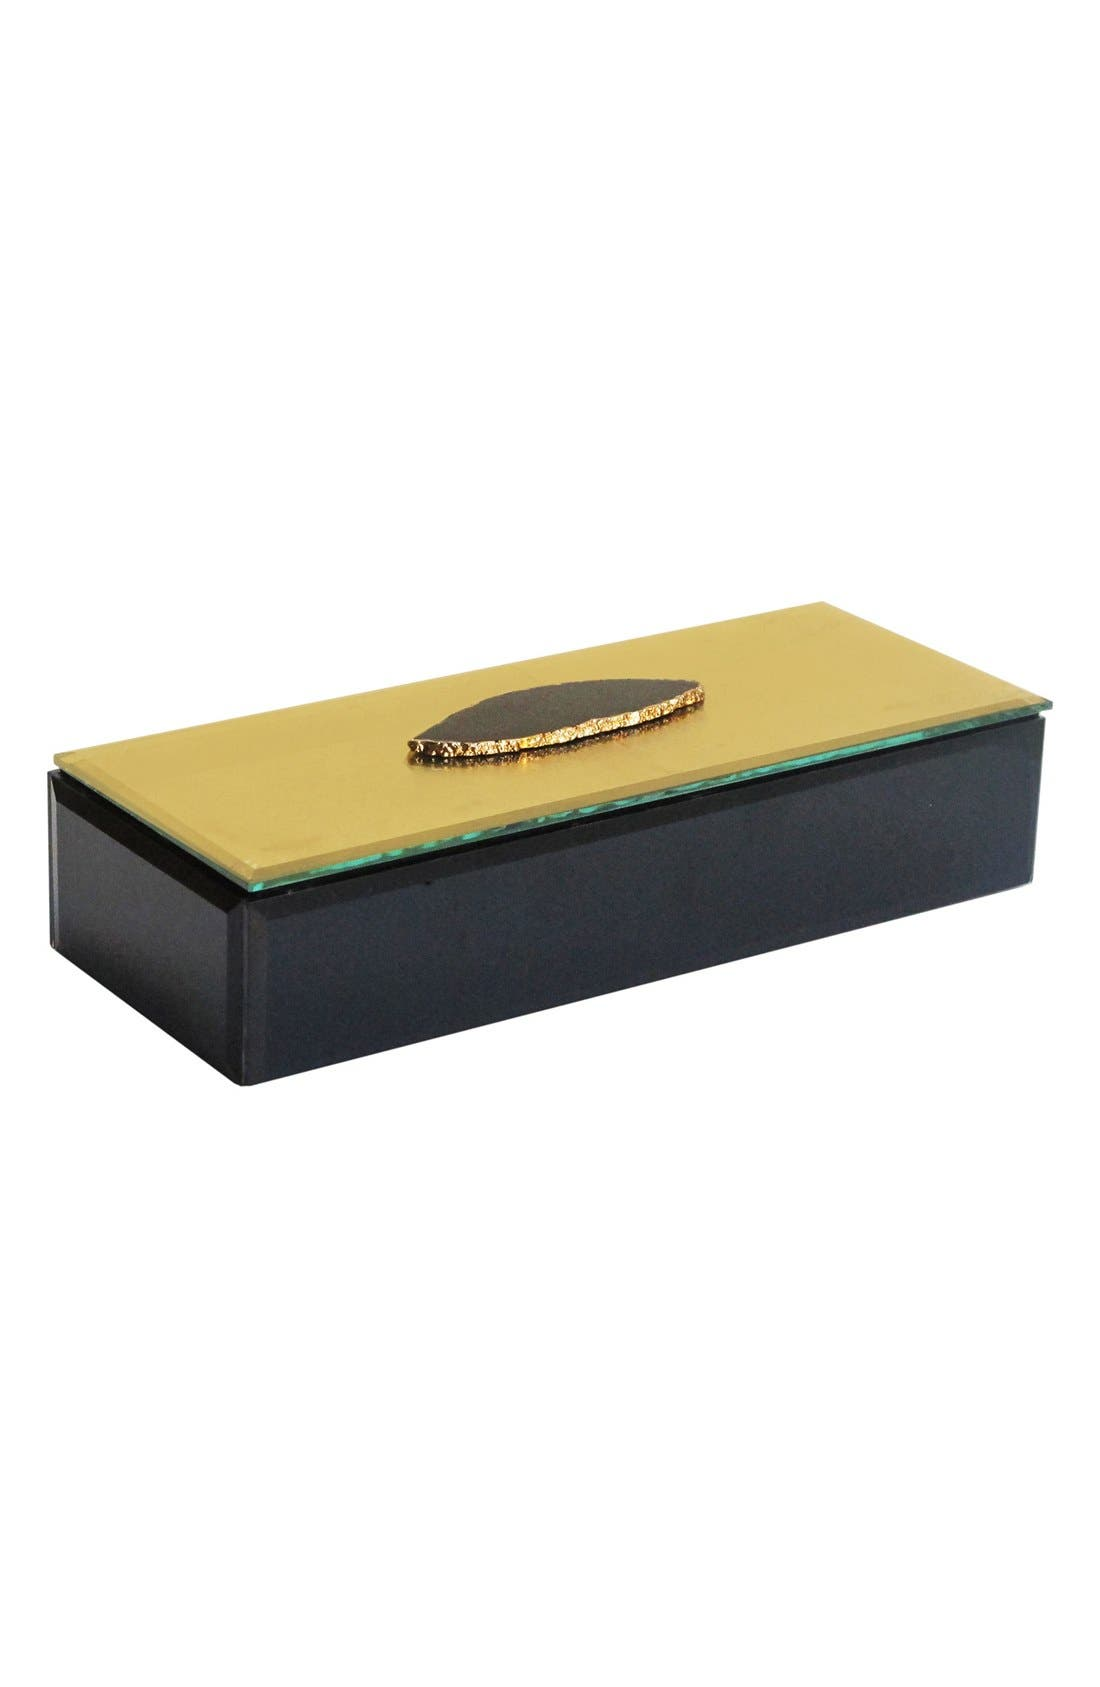 Alternate Image 1 Selected - American Atelier Agate Box